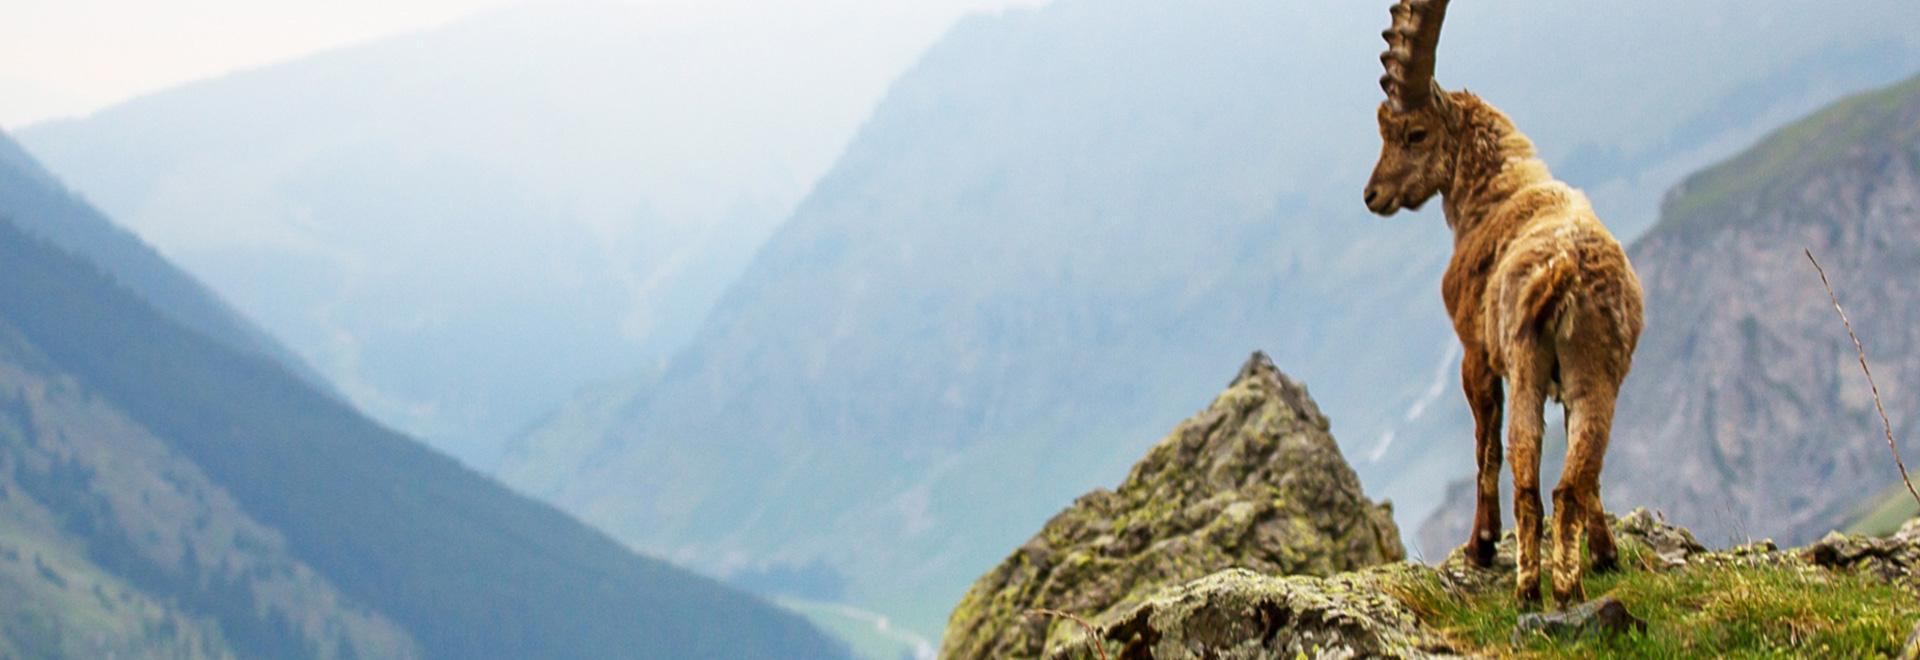 In vetta alle Alpi